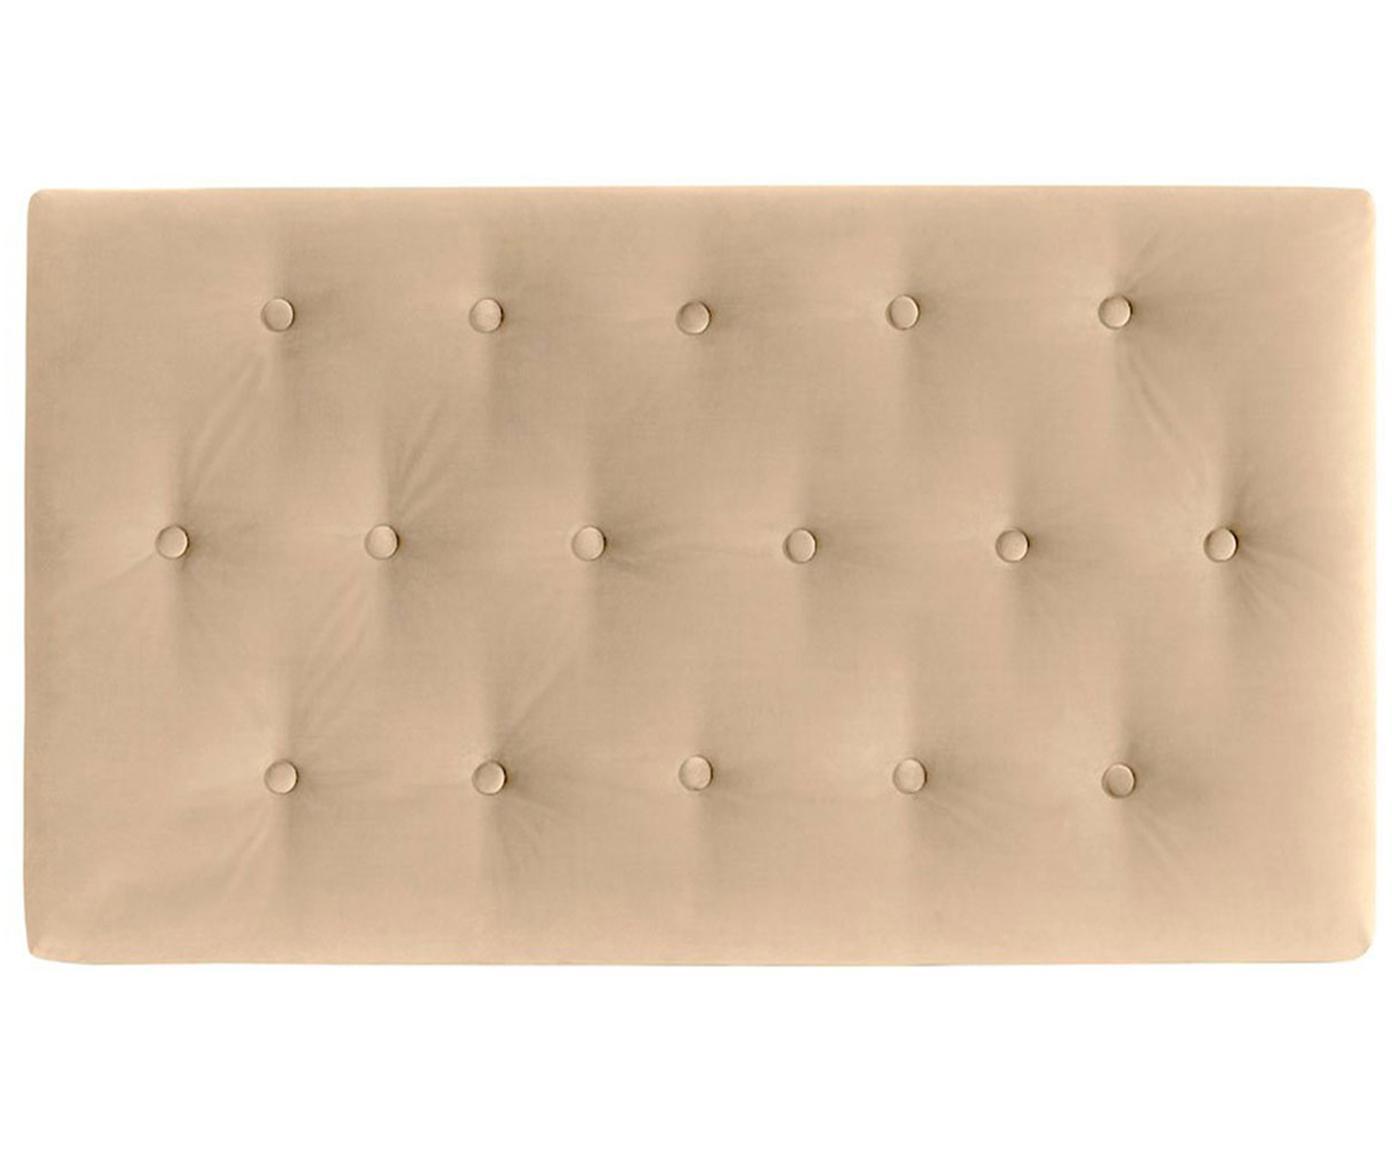 Cabecero Paris Dot, Estructura: tablero de fibras de dens, Tapizado: 100%poliéster efecto ter, Interior: guata doble 500g (100%p, Beige, An 135 x Al 80 cm